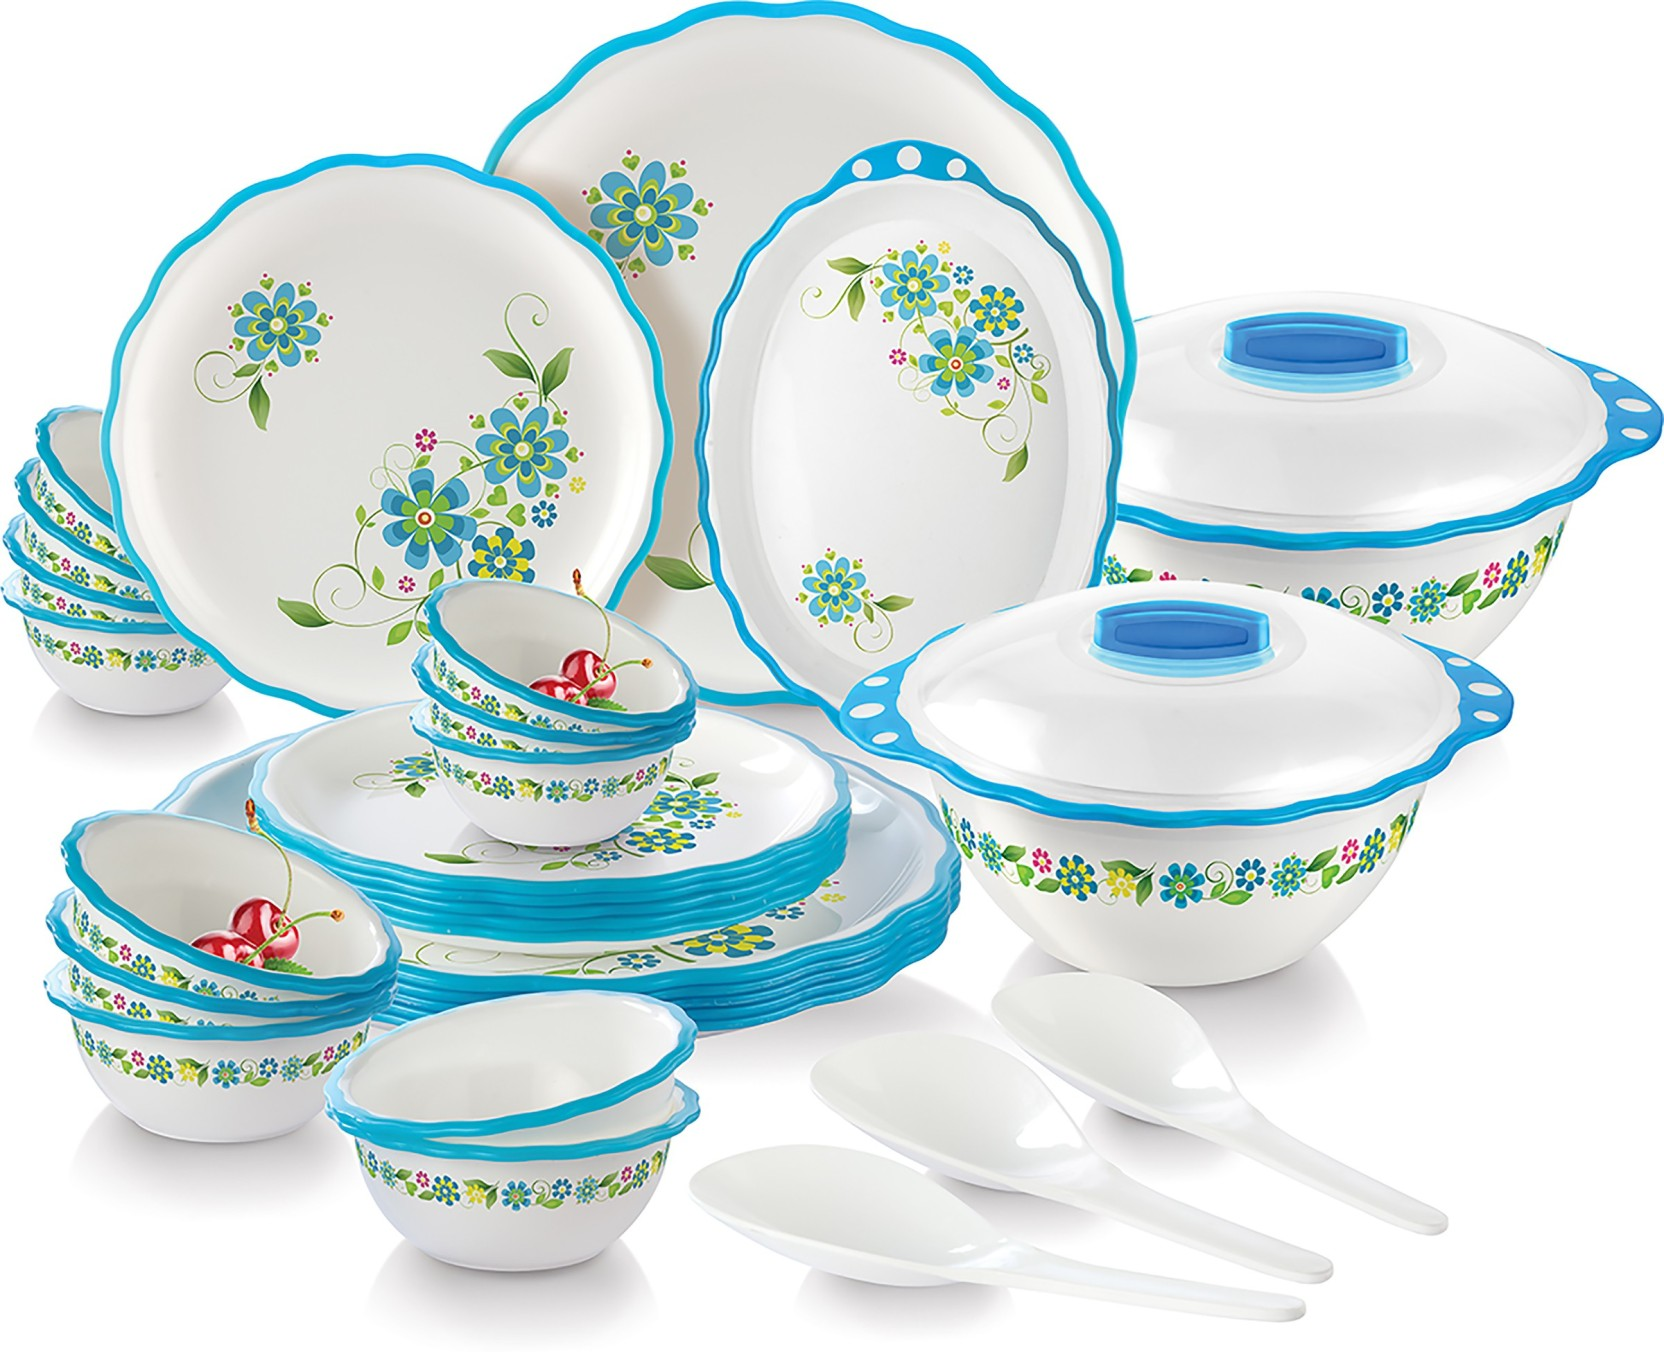 Joyo Home Wave Microwave Safe Round(32 Pcs (Blue)) Dinner Set Price ...